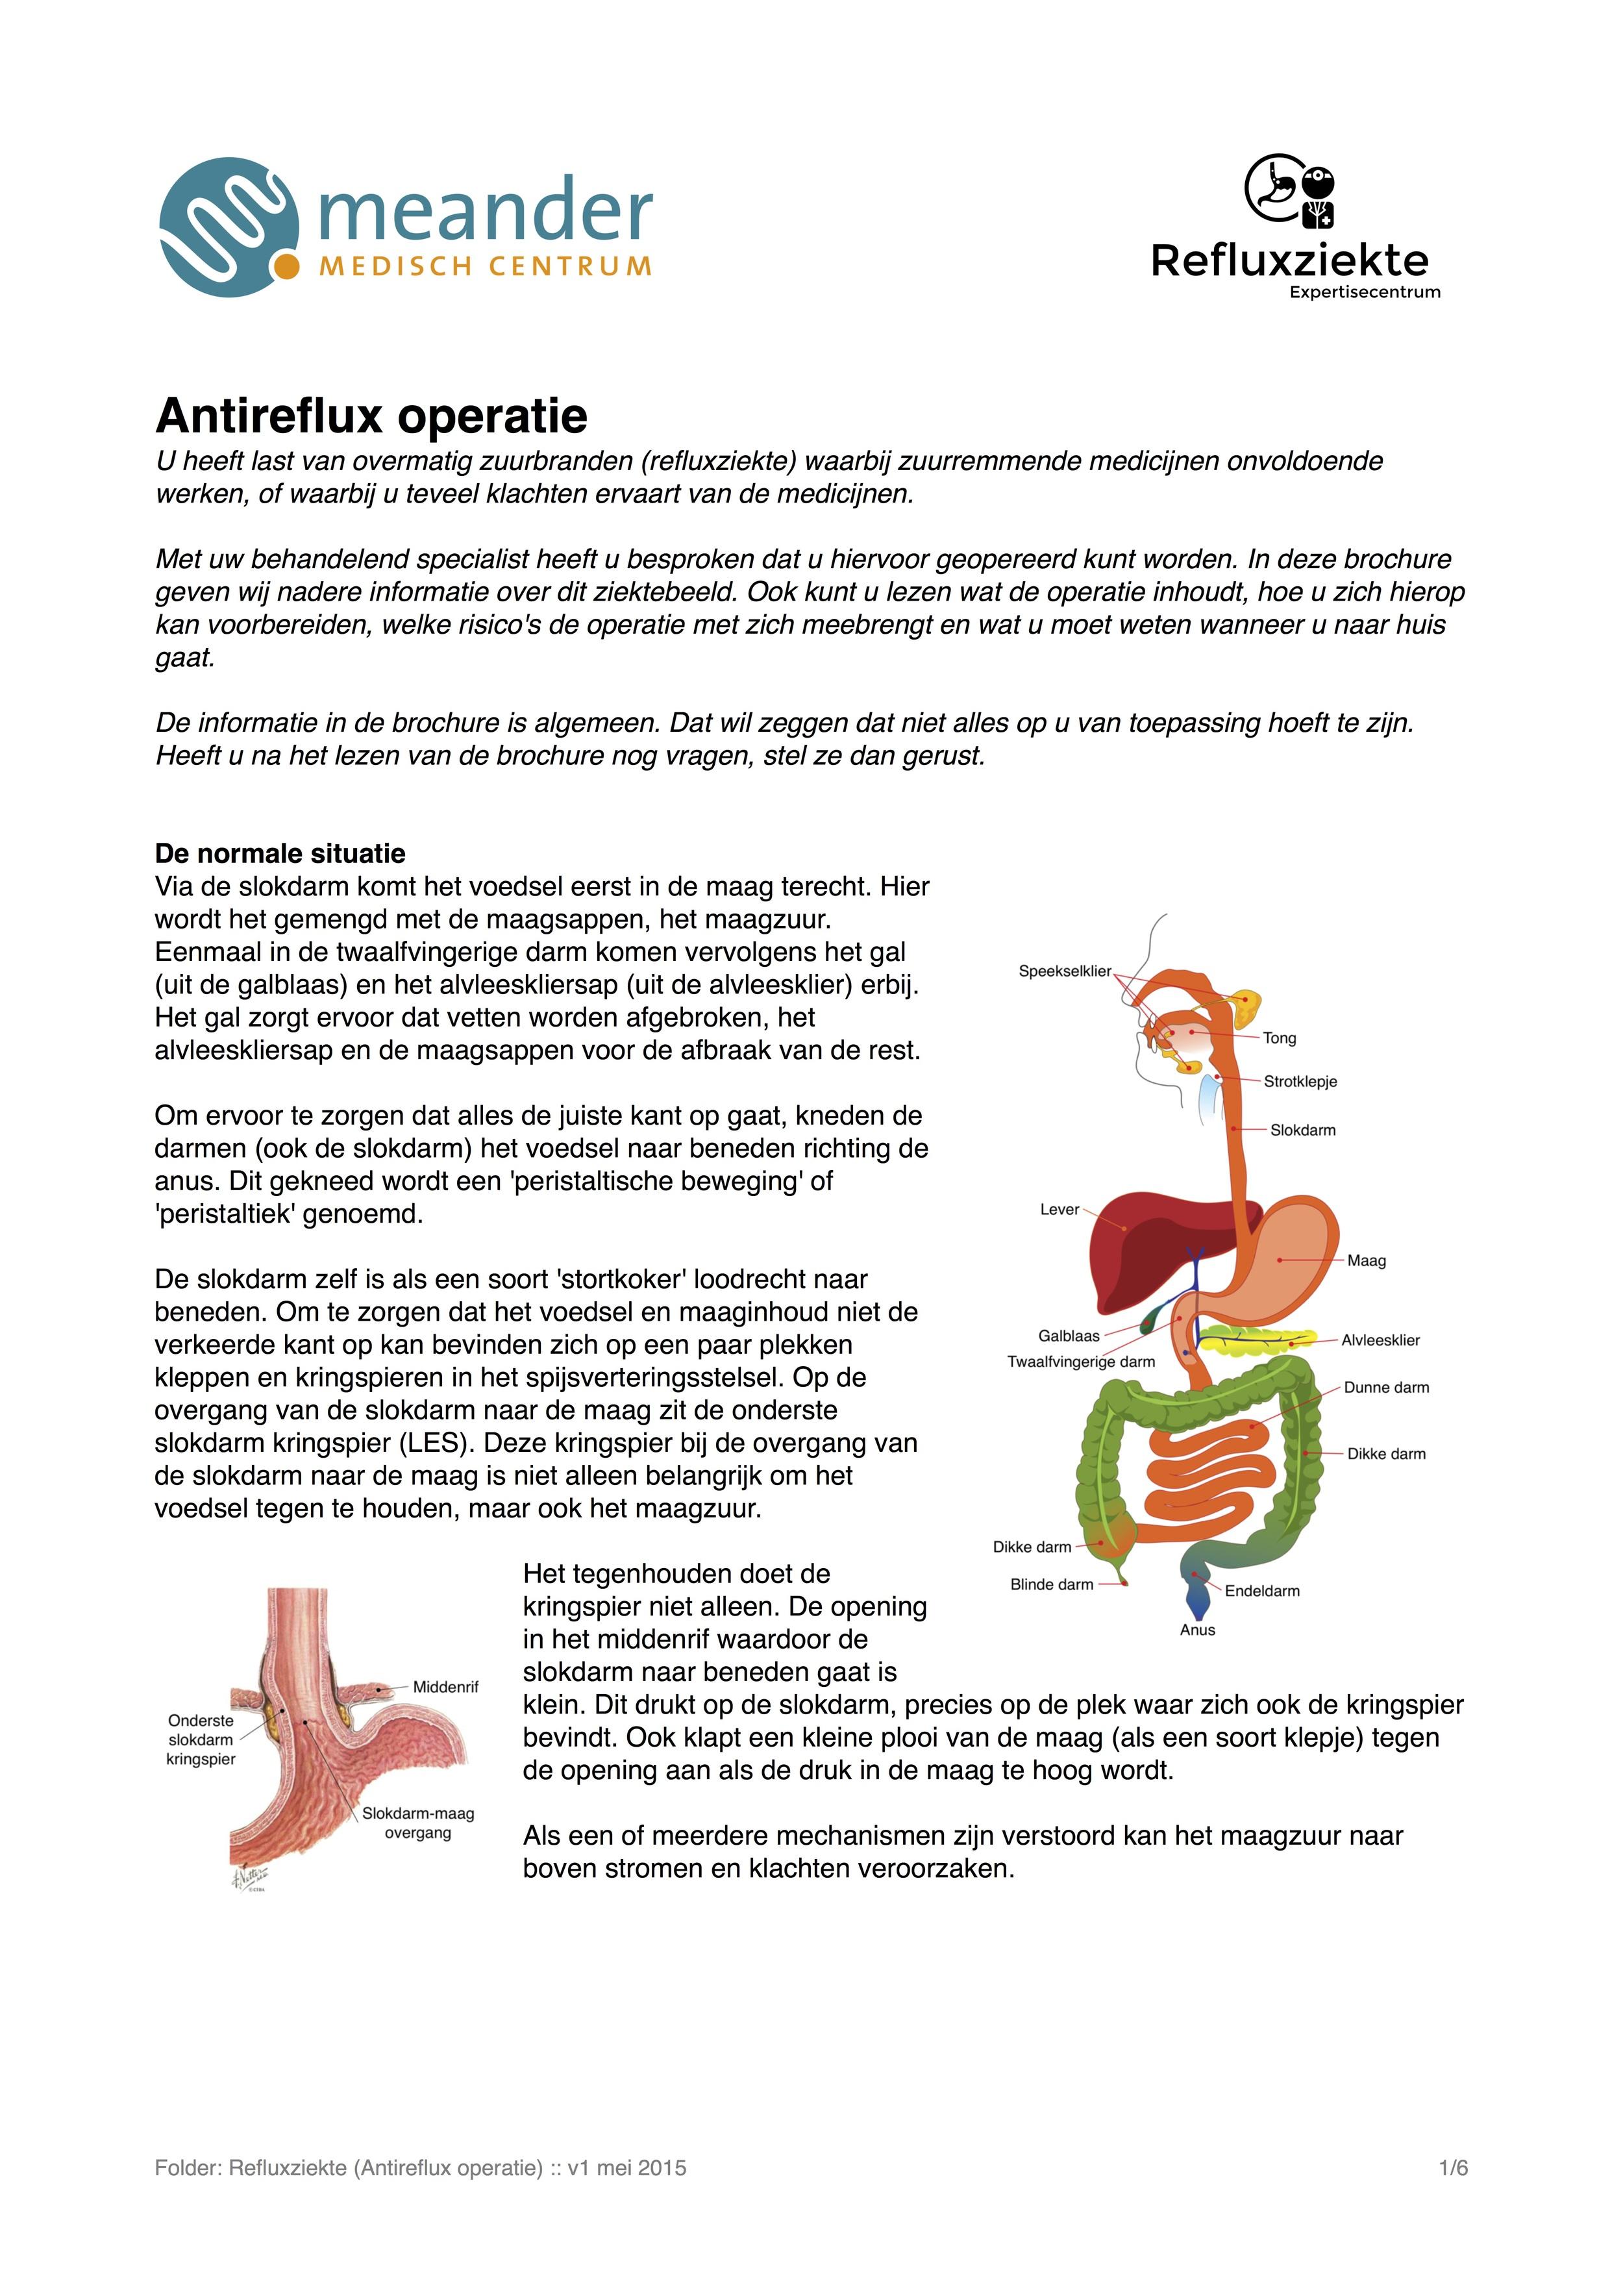 Folder antireflux operatie.jpg